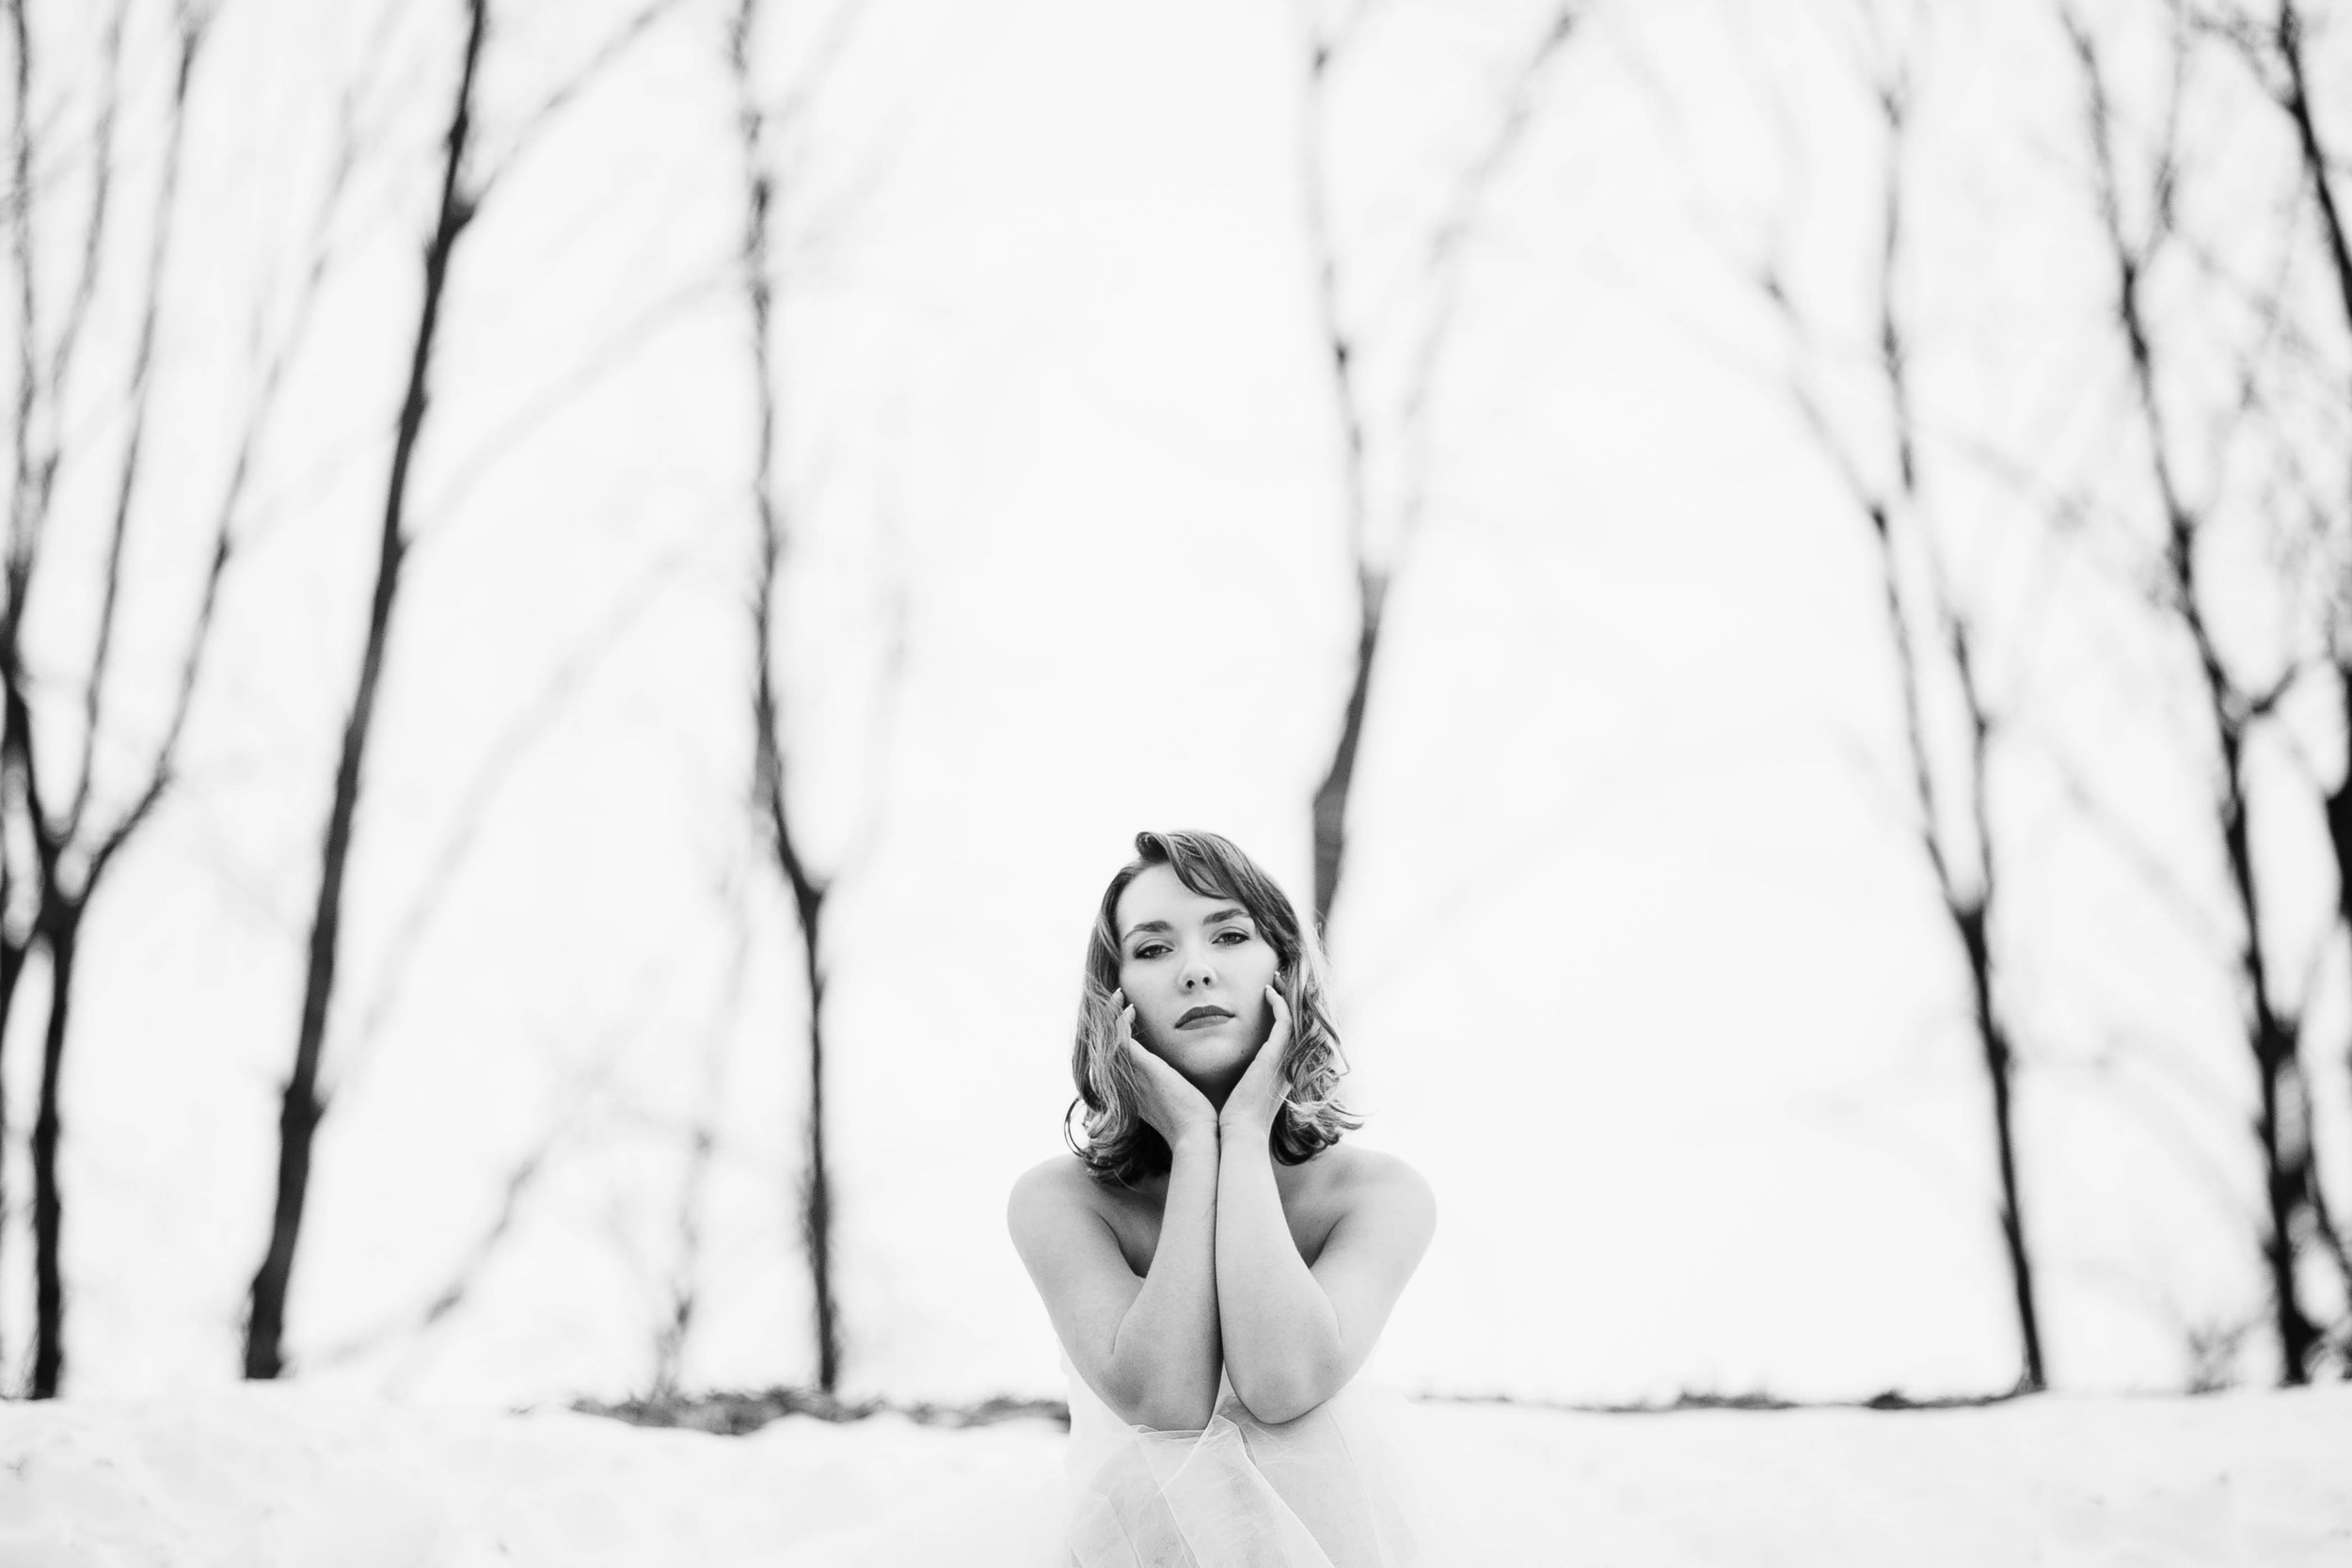 SarahSovereignPhotography_KateFairley (8).jpg